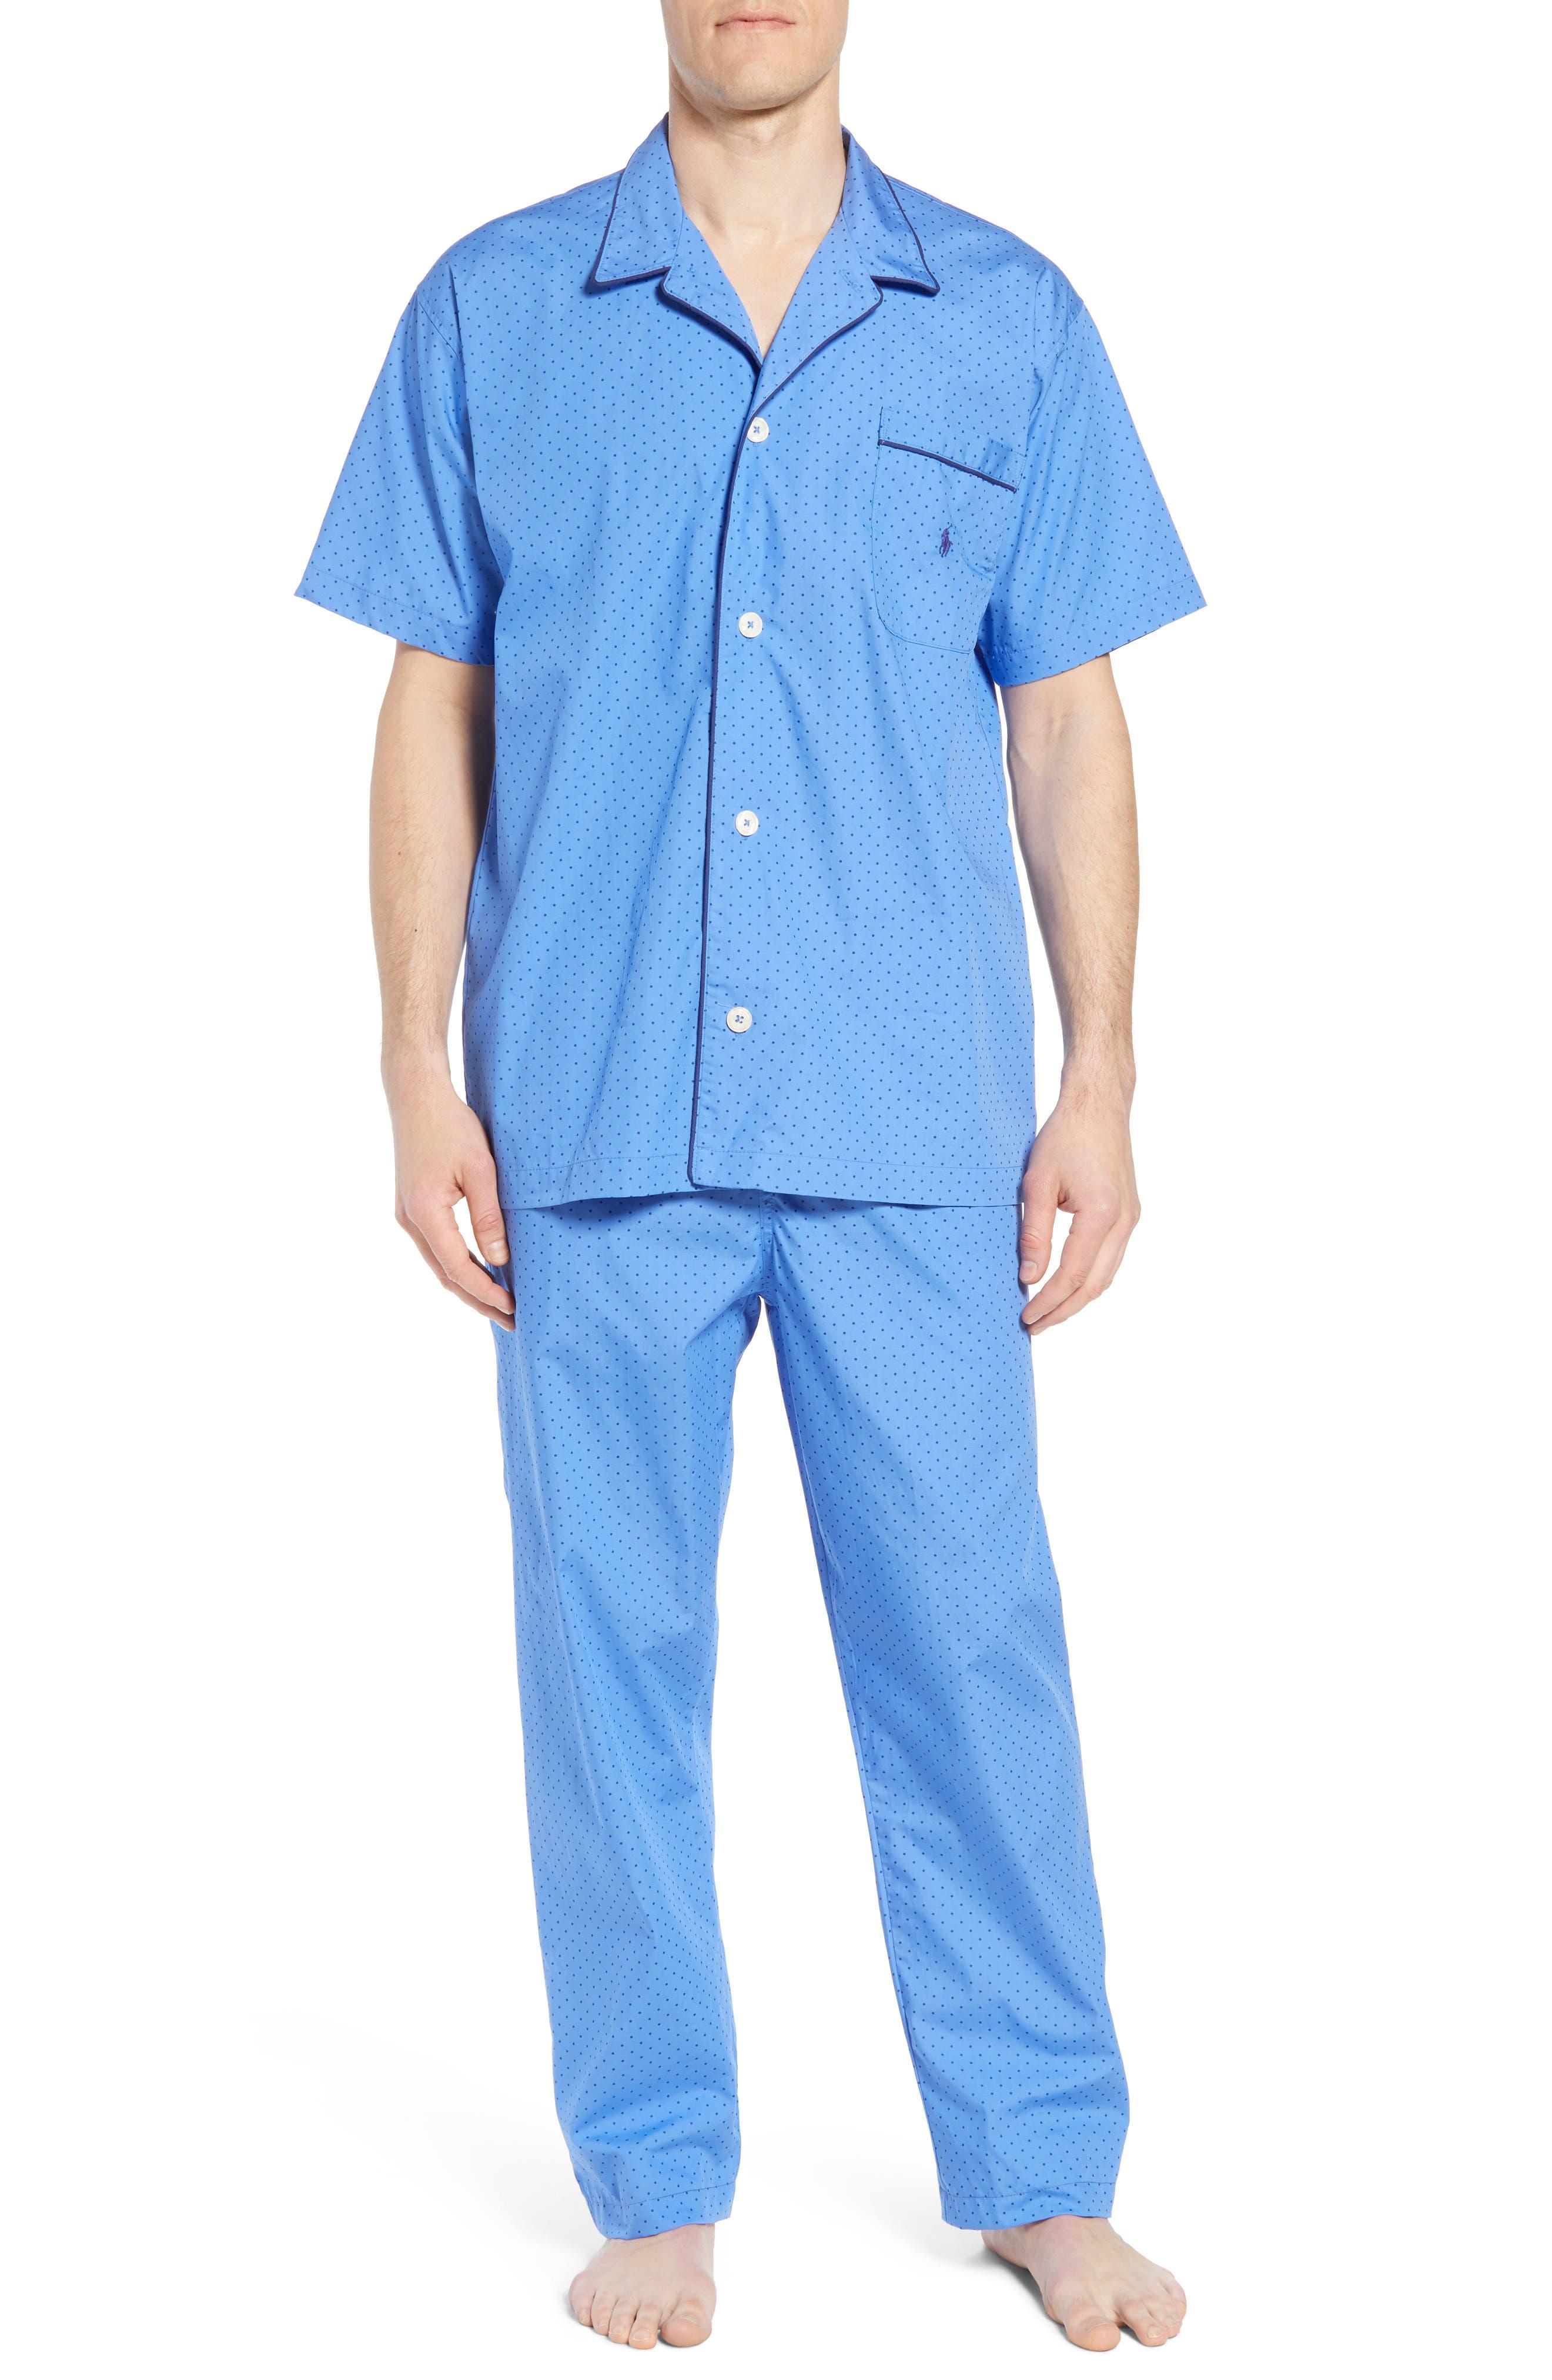 Dot Cotton Pajama Shirt,                             Alternate thumbnail 6, color,                             Harbour Island Blue/ Navy